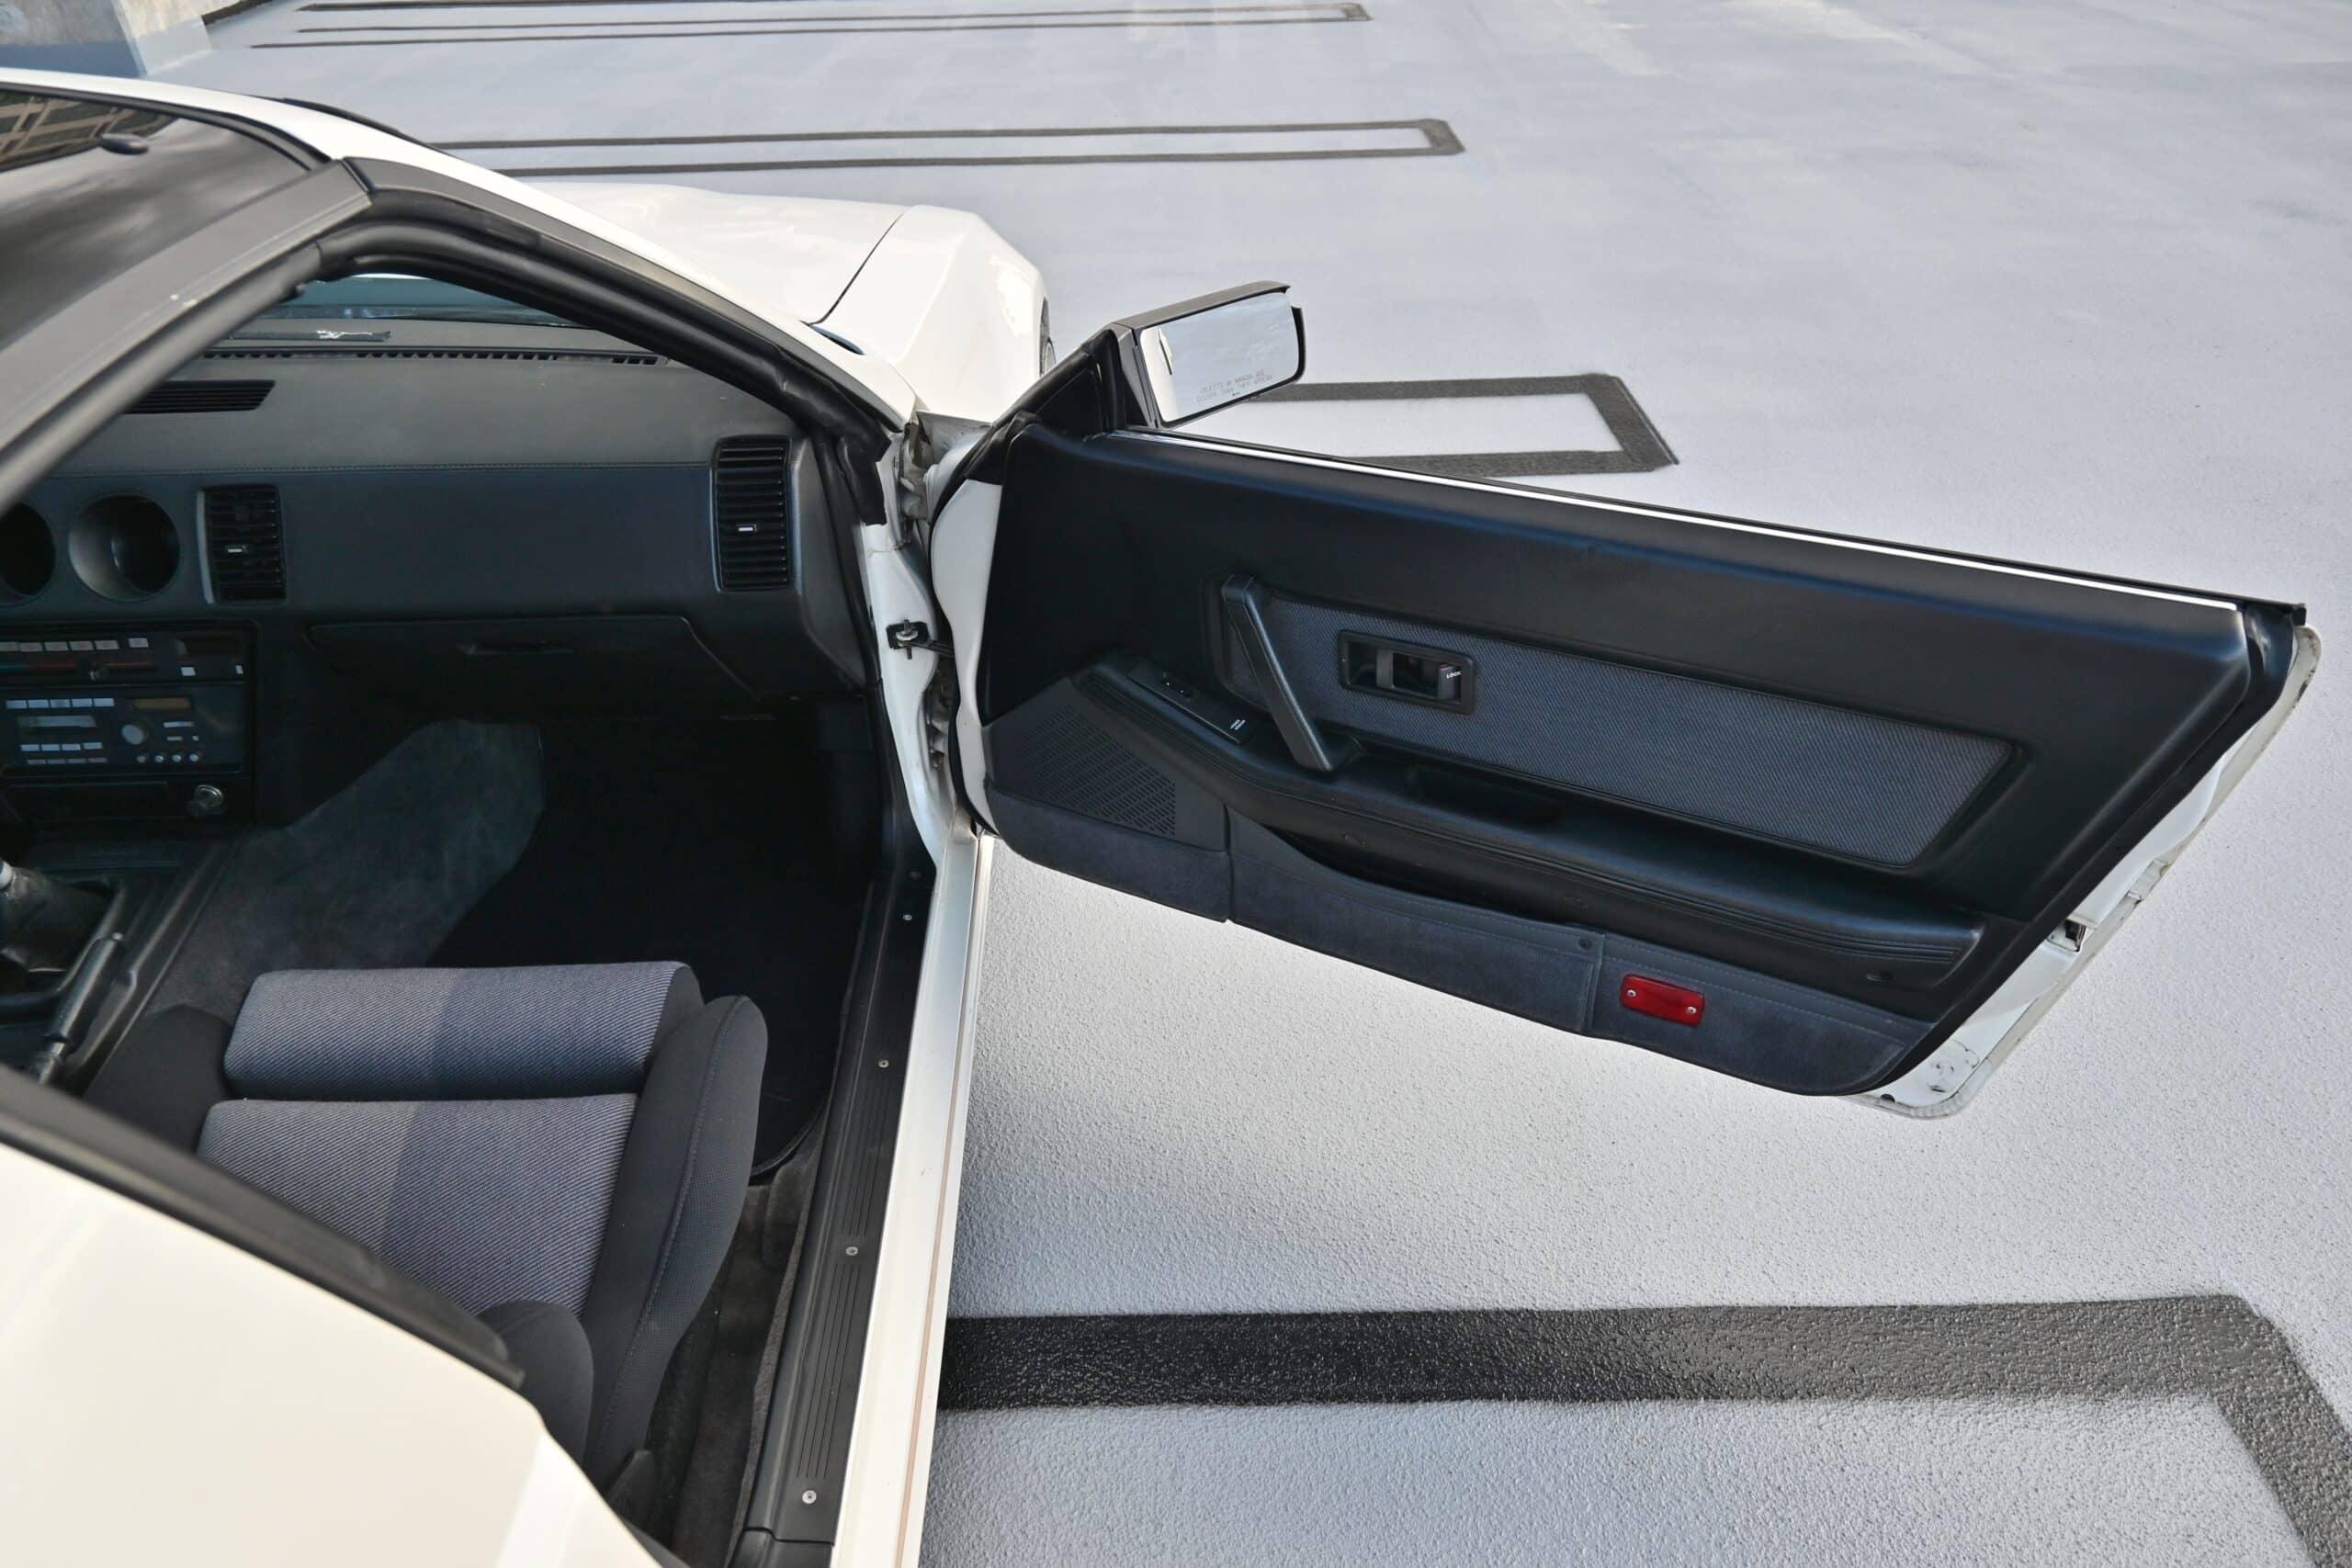 1988 Nissan 300ZX Turbo Shiro #797 Recaro Seats – Coilovers – BC Forged Wheels – Upgraded Turbo 300HP – Nice Mods